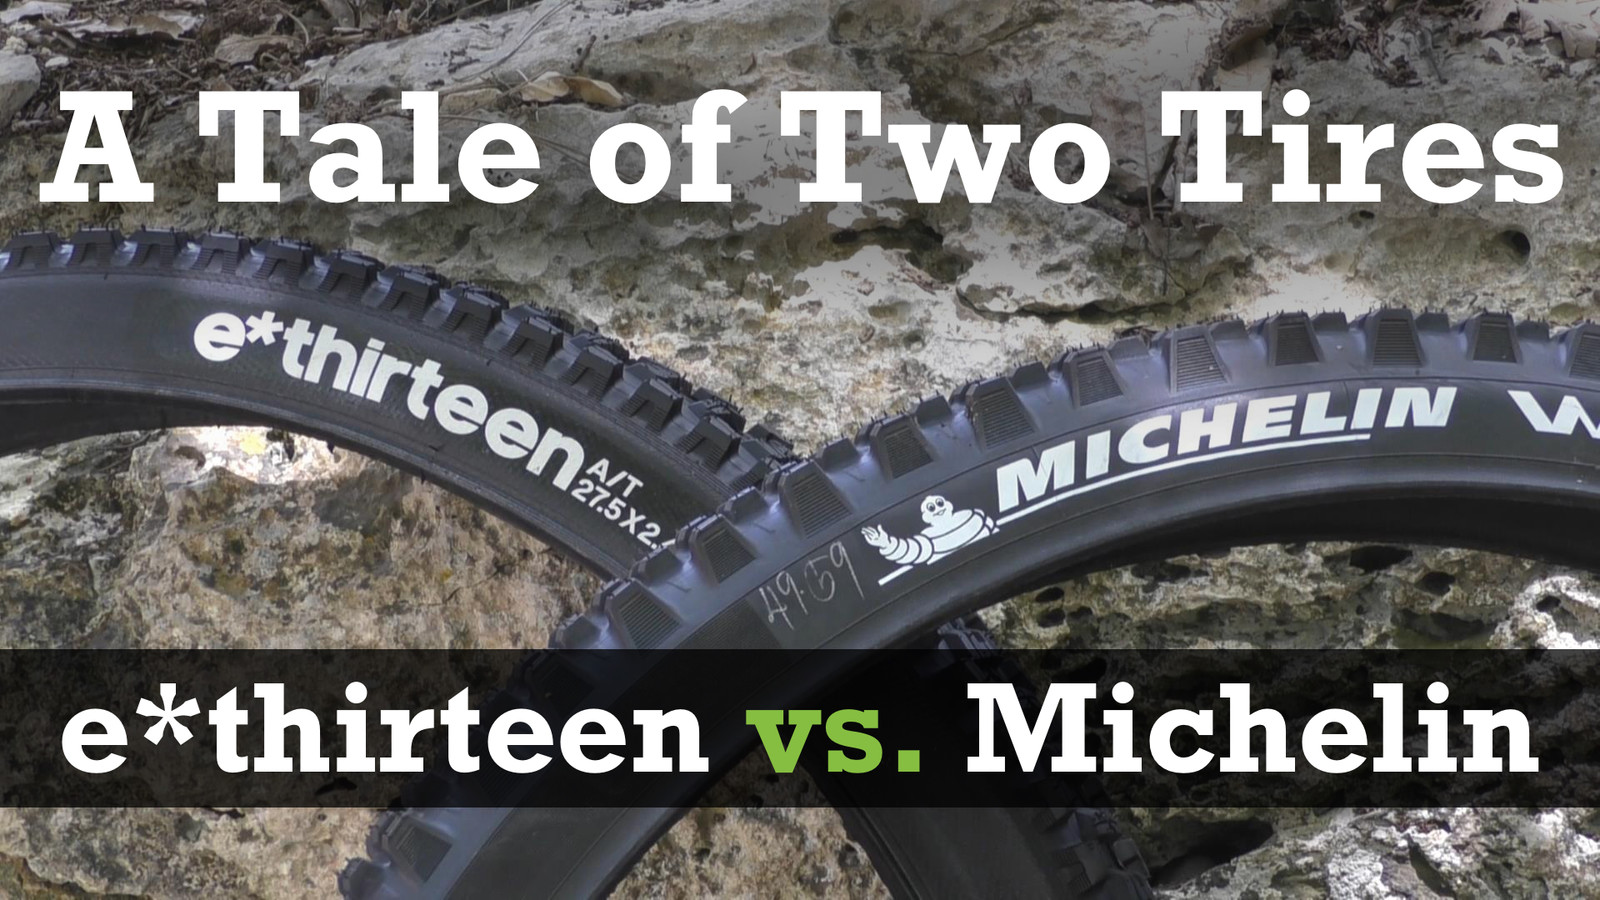 MTB Tire Test: Michelin Wild Enduro vs. e*thirteen LG1r EN MoPo